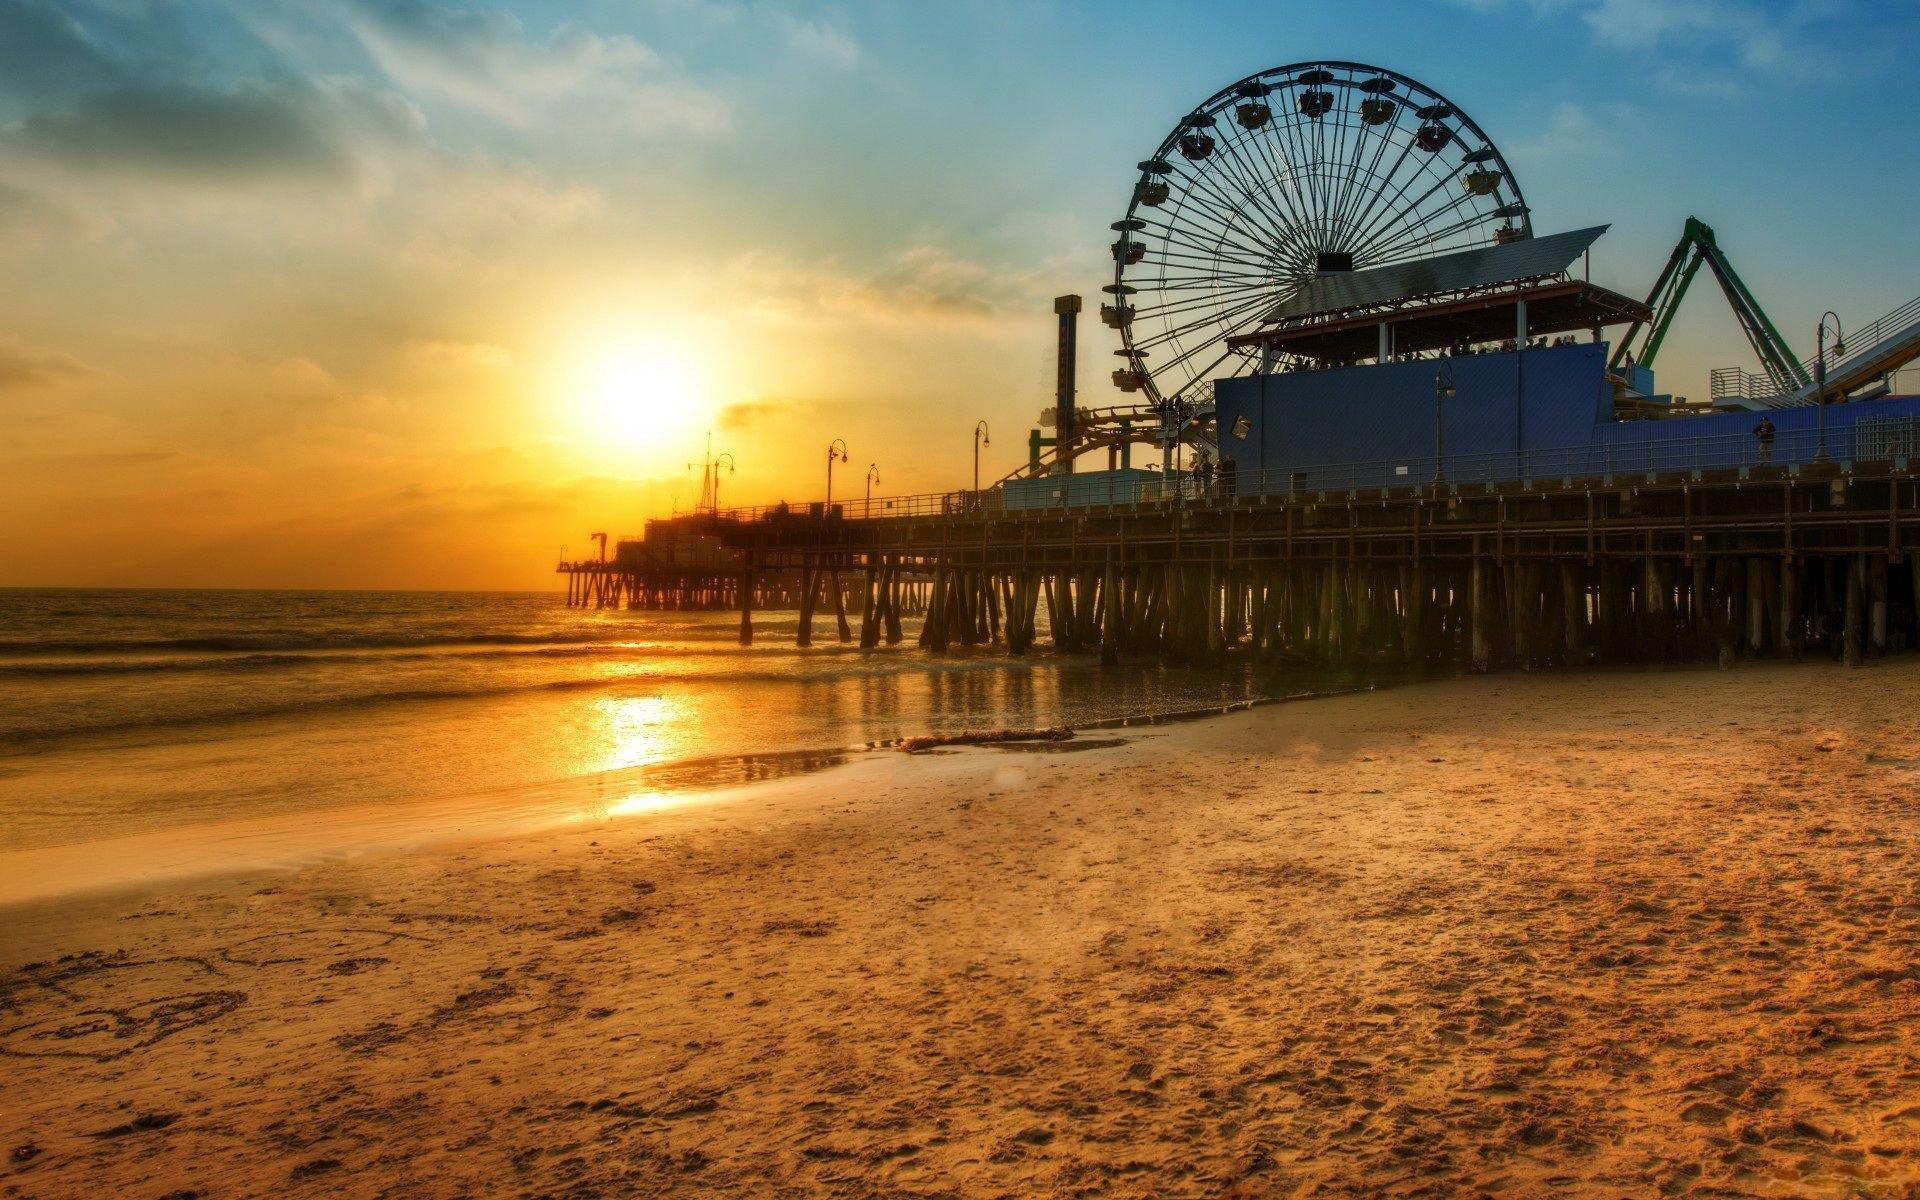 картинки пляж лос-анджелеса мастер-классы для